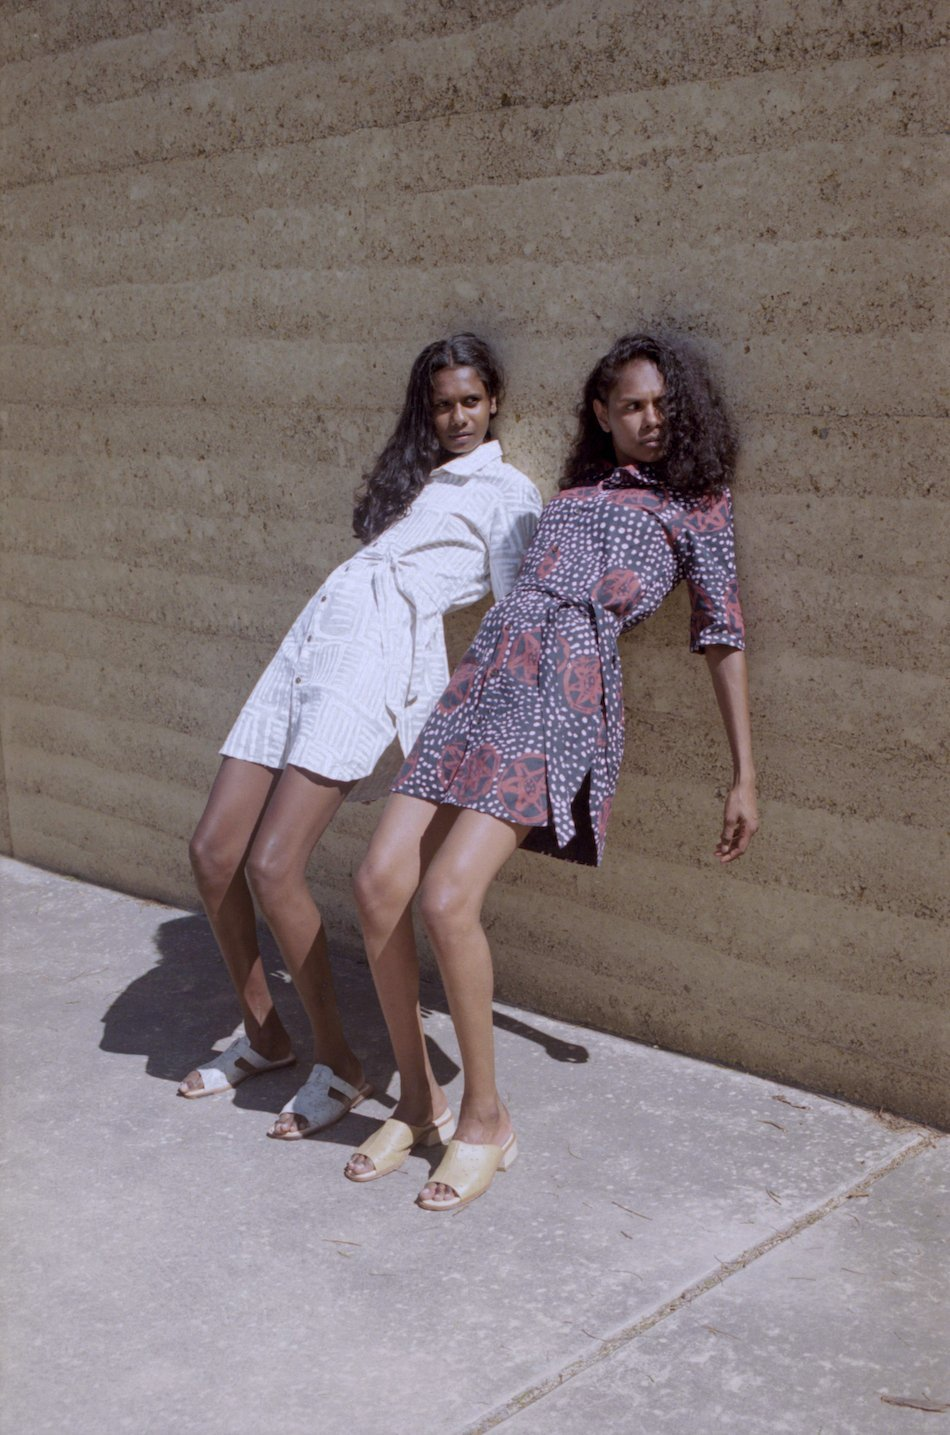 Models from Jira Indigenous Modelling Agency